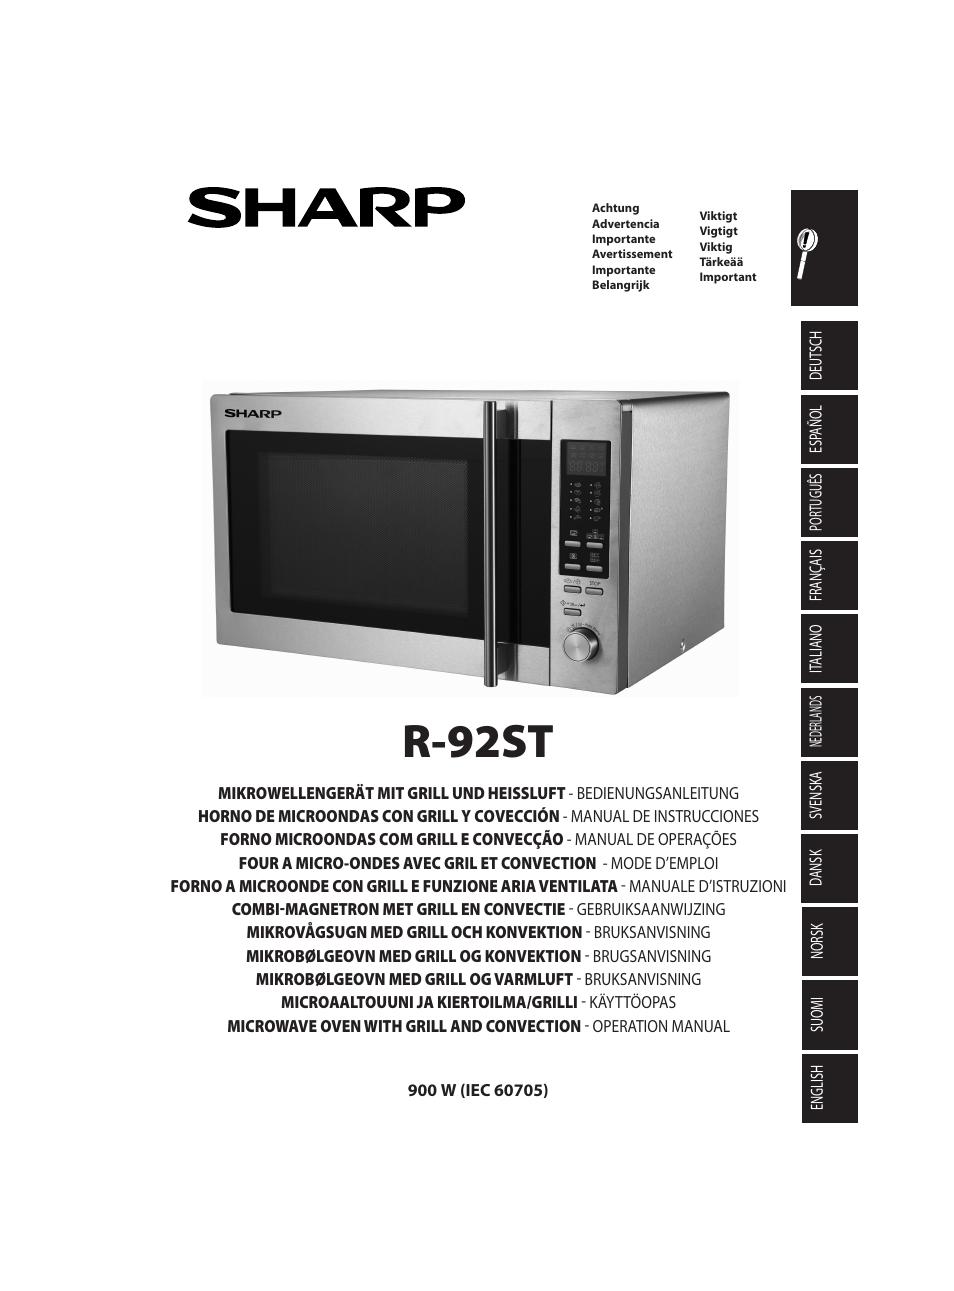 sharp r 92stw four micro ondes combin user manual 290. Black Bedroom Furniture Sets. Home Design Ideas